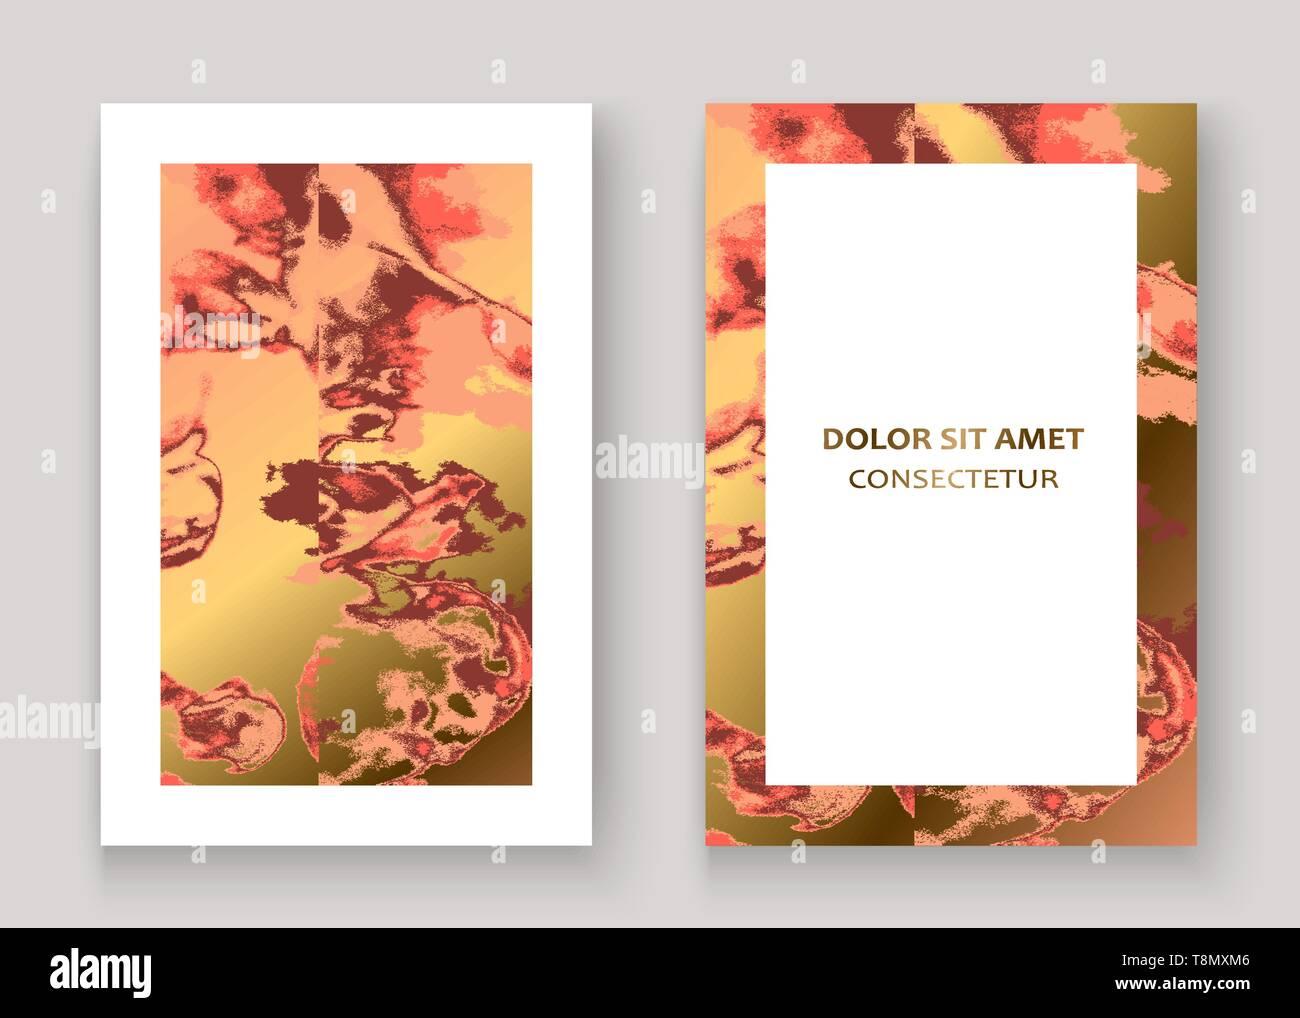 dbd523cc2 Textura de mármol coral de oro resumen antecedentes en diseño gráfico.  Glitter rosa de oro